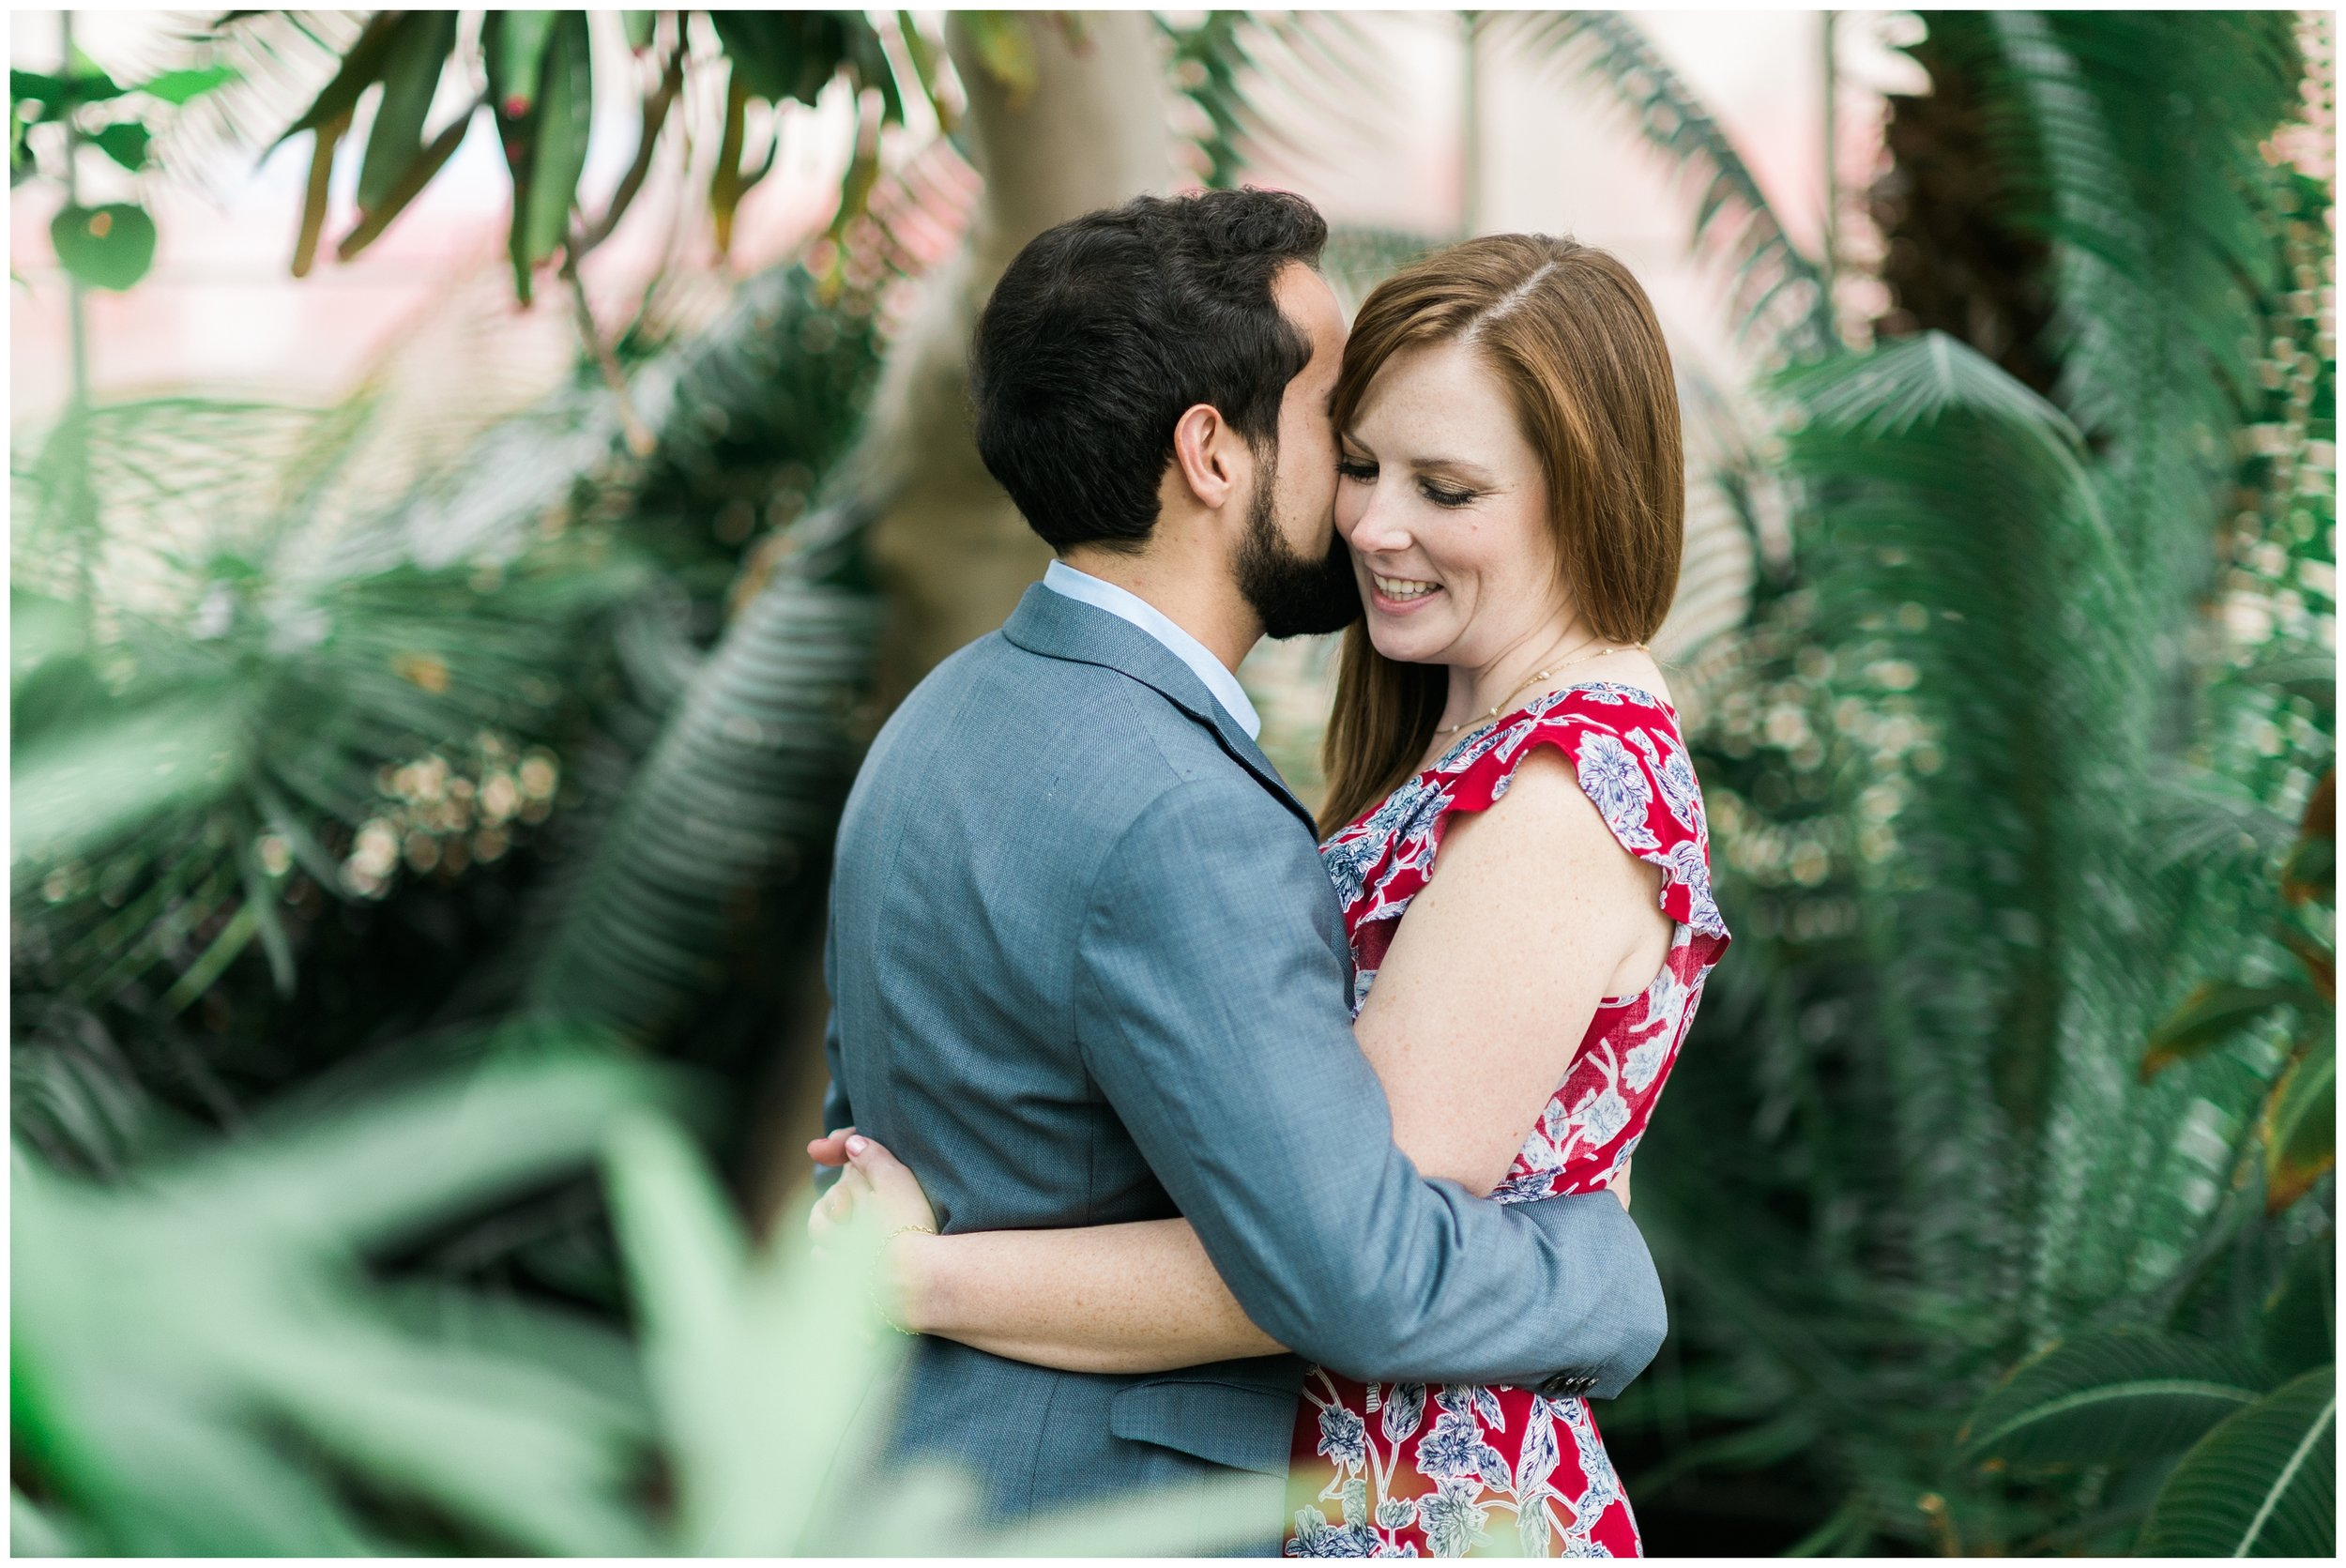 Rebecca_Bridges_Photography_Indianapolis_Wedding_Photographer_6001.jpg